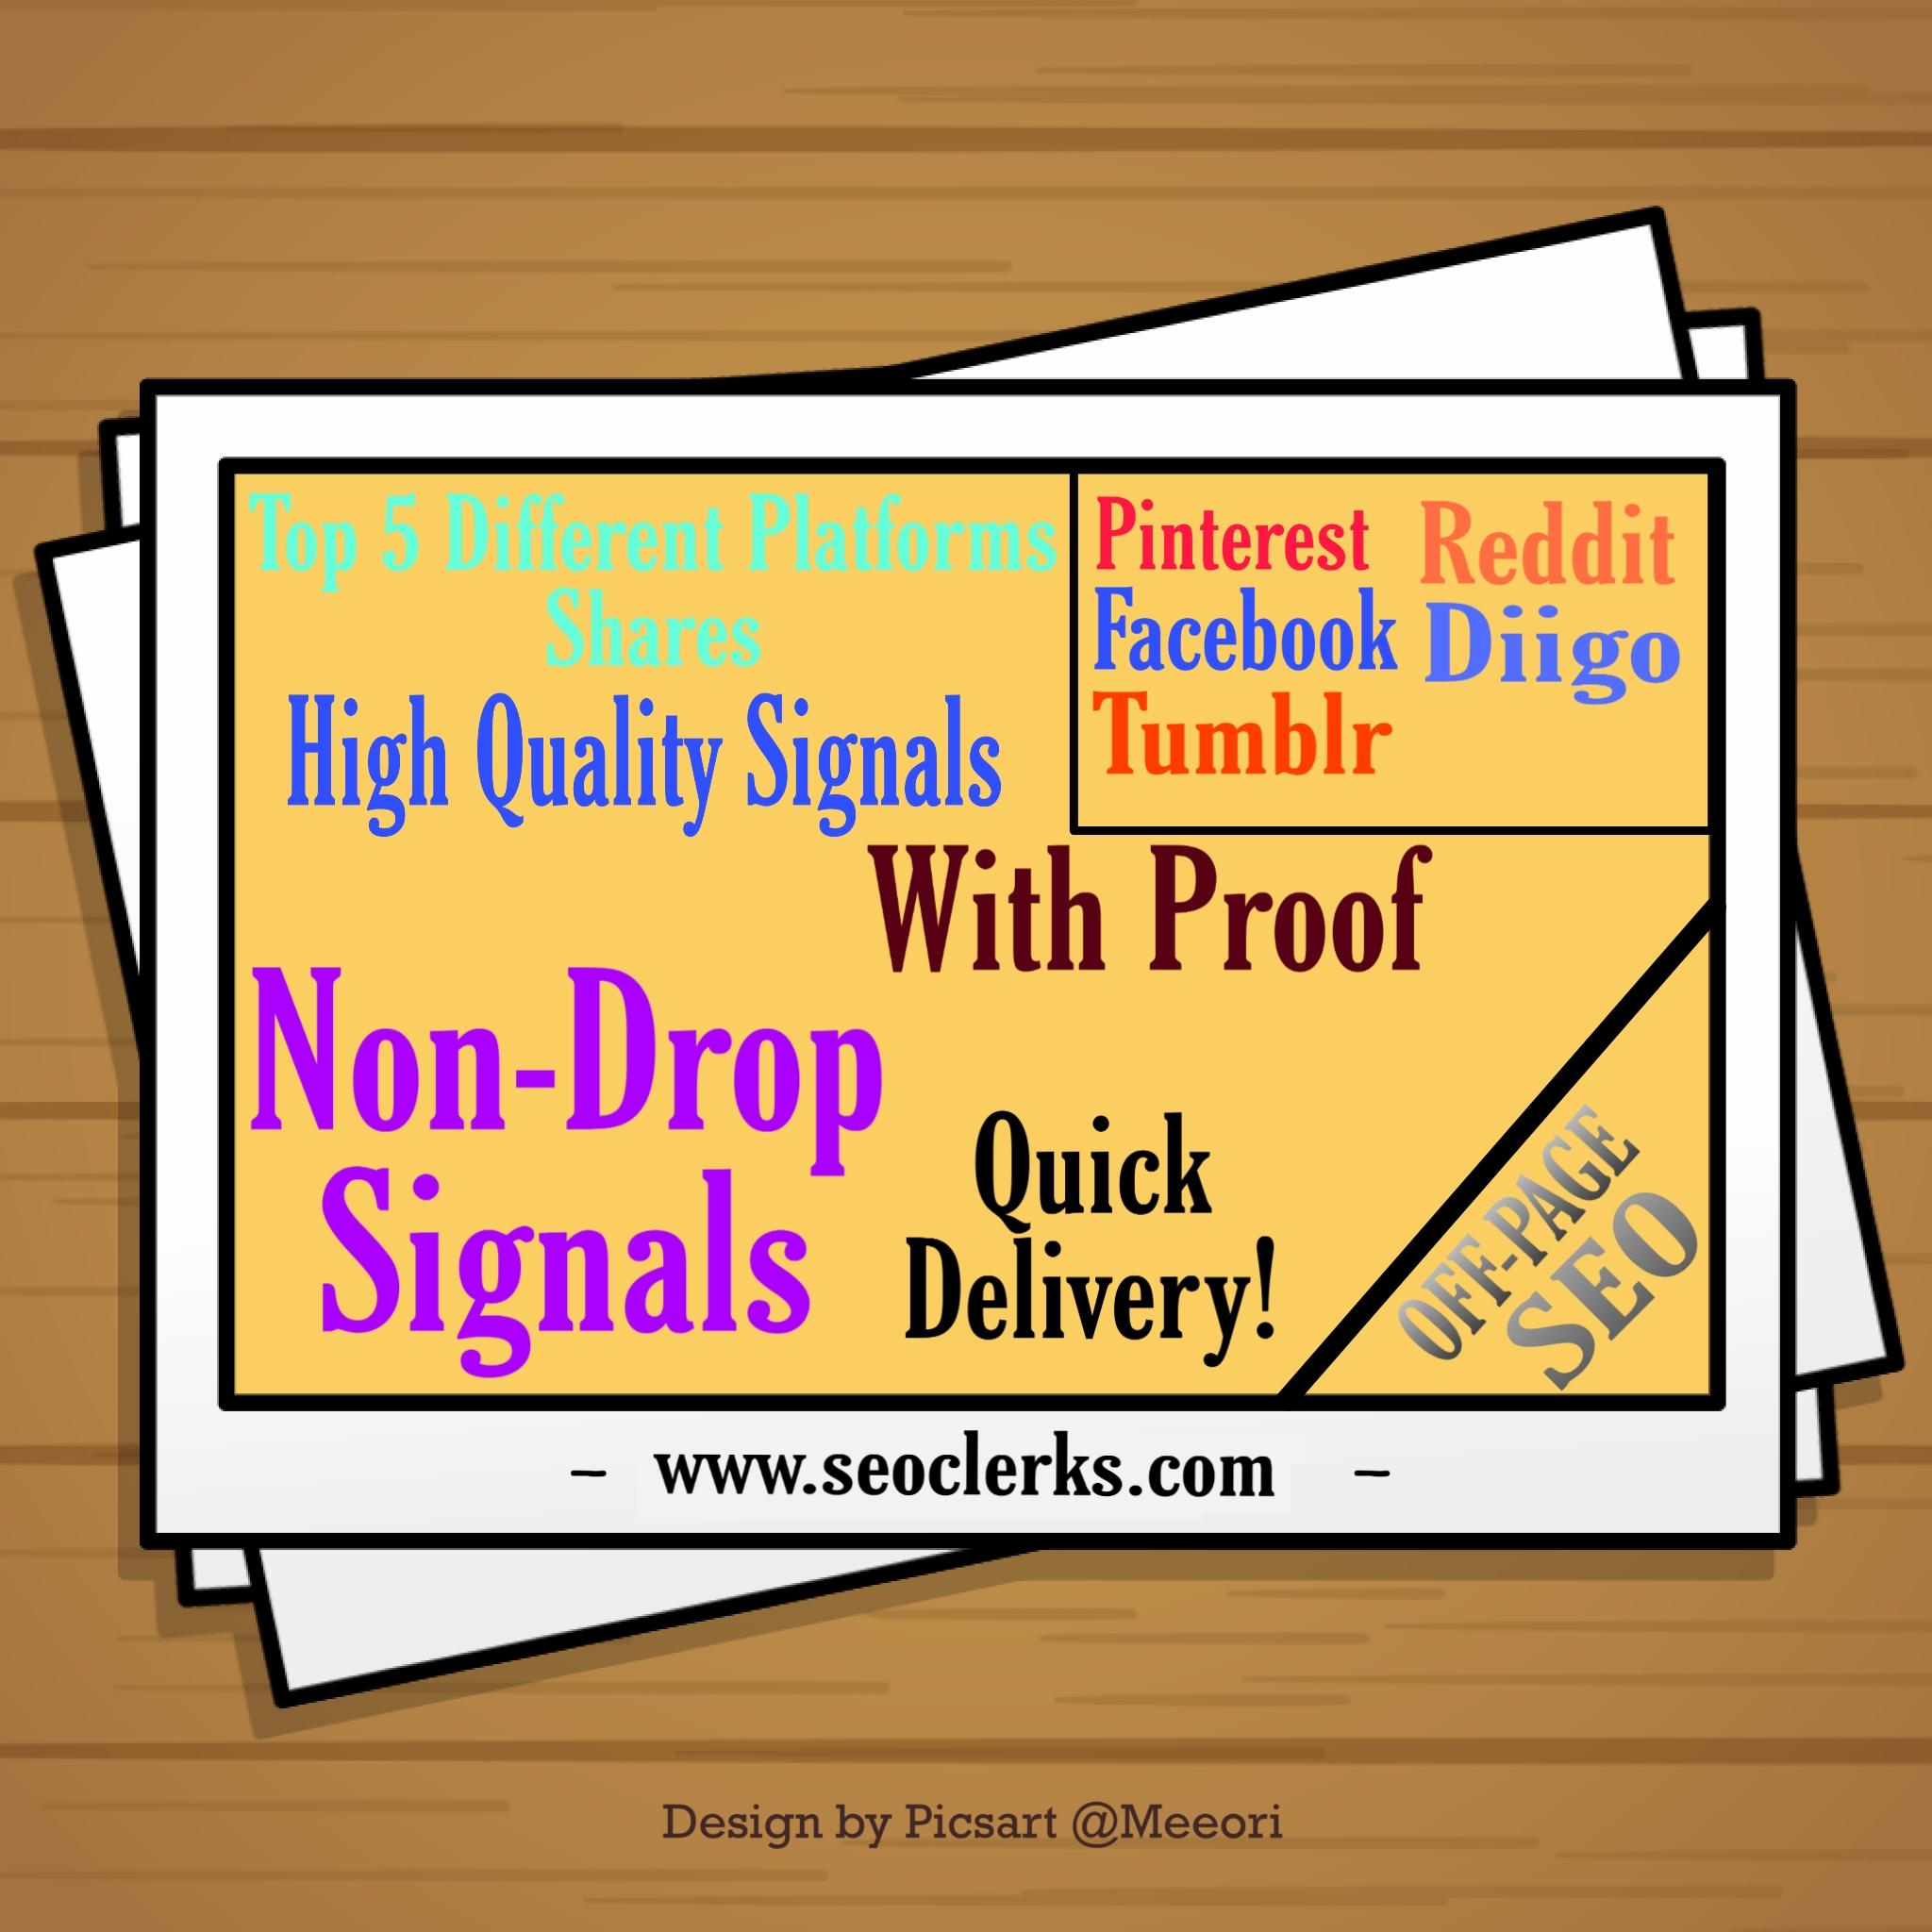 Best 5 platforms 8,185 Mixed signals of Facebook/Reddit/Pinterest/Diigo/Tumblr.